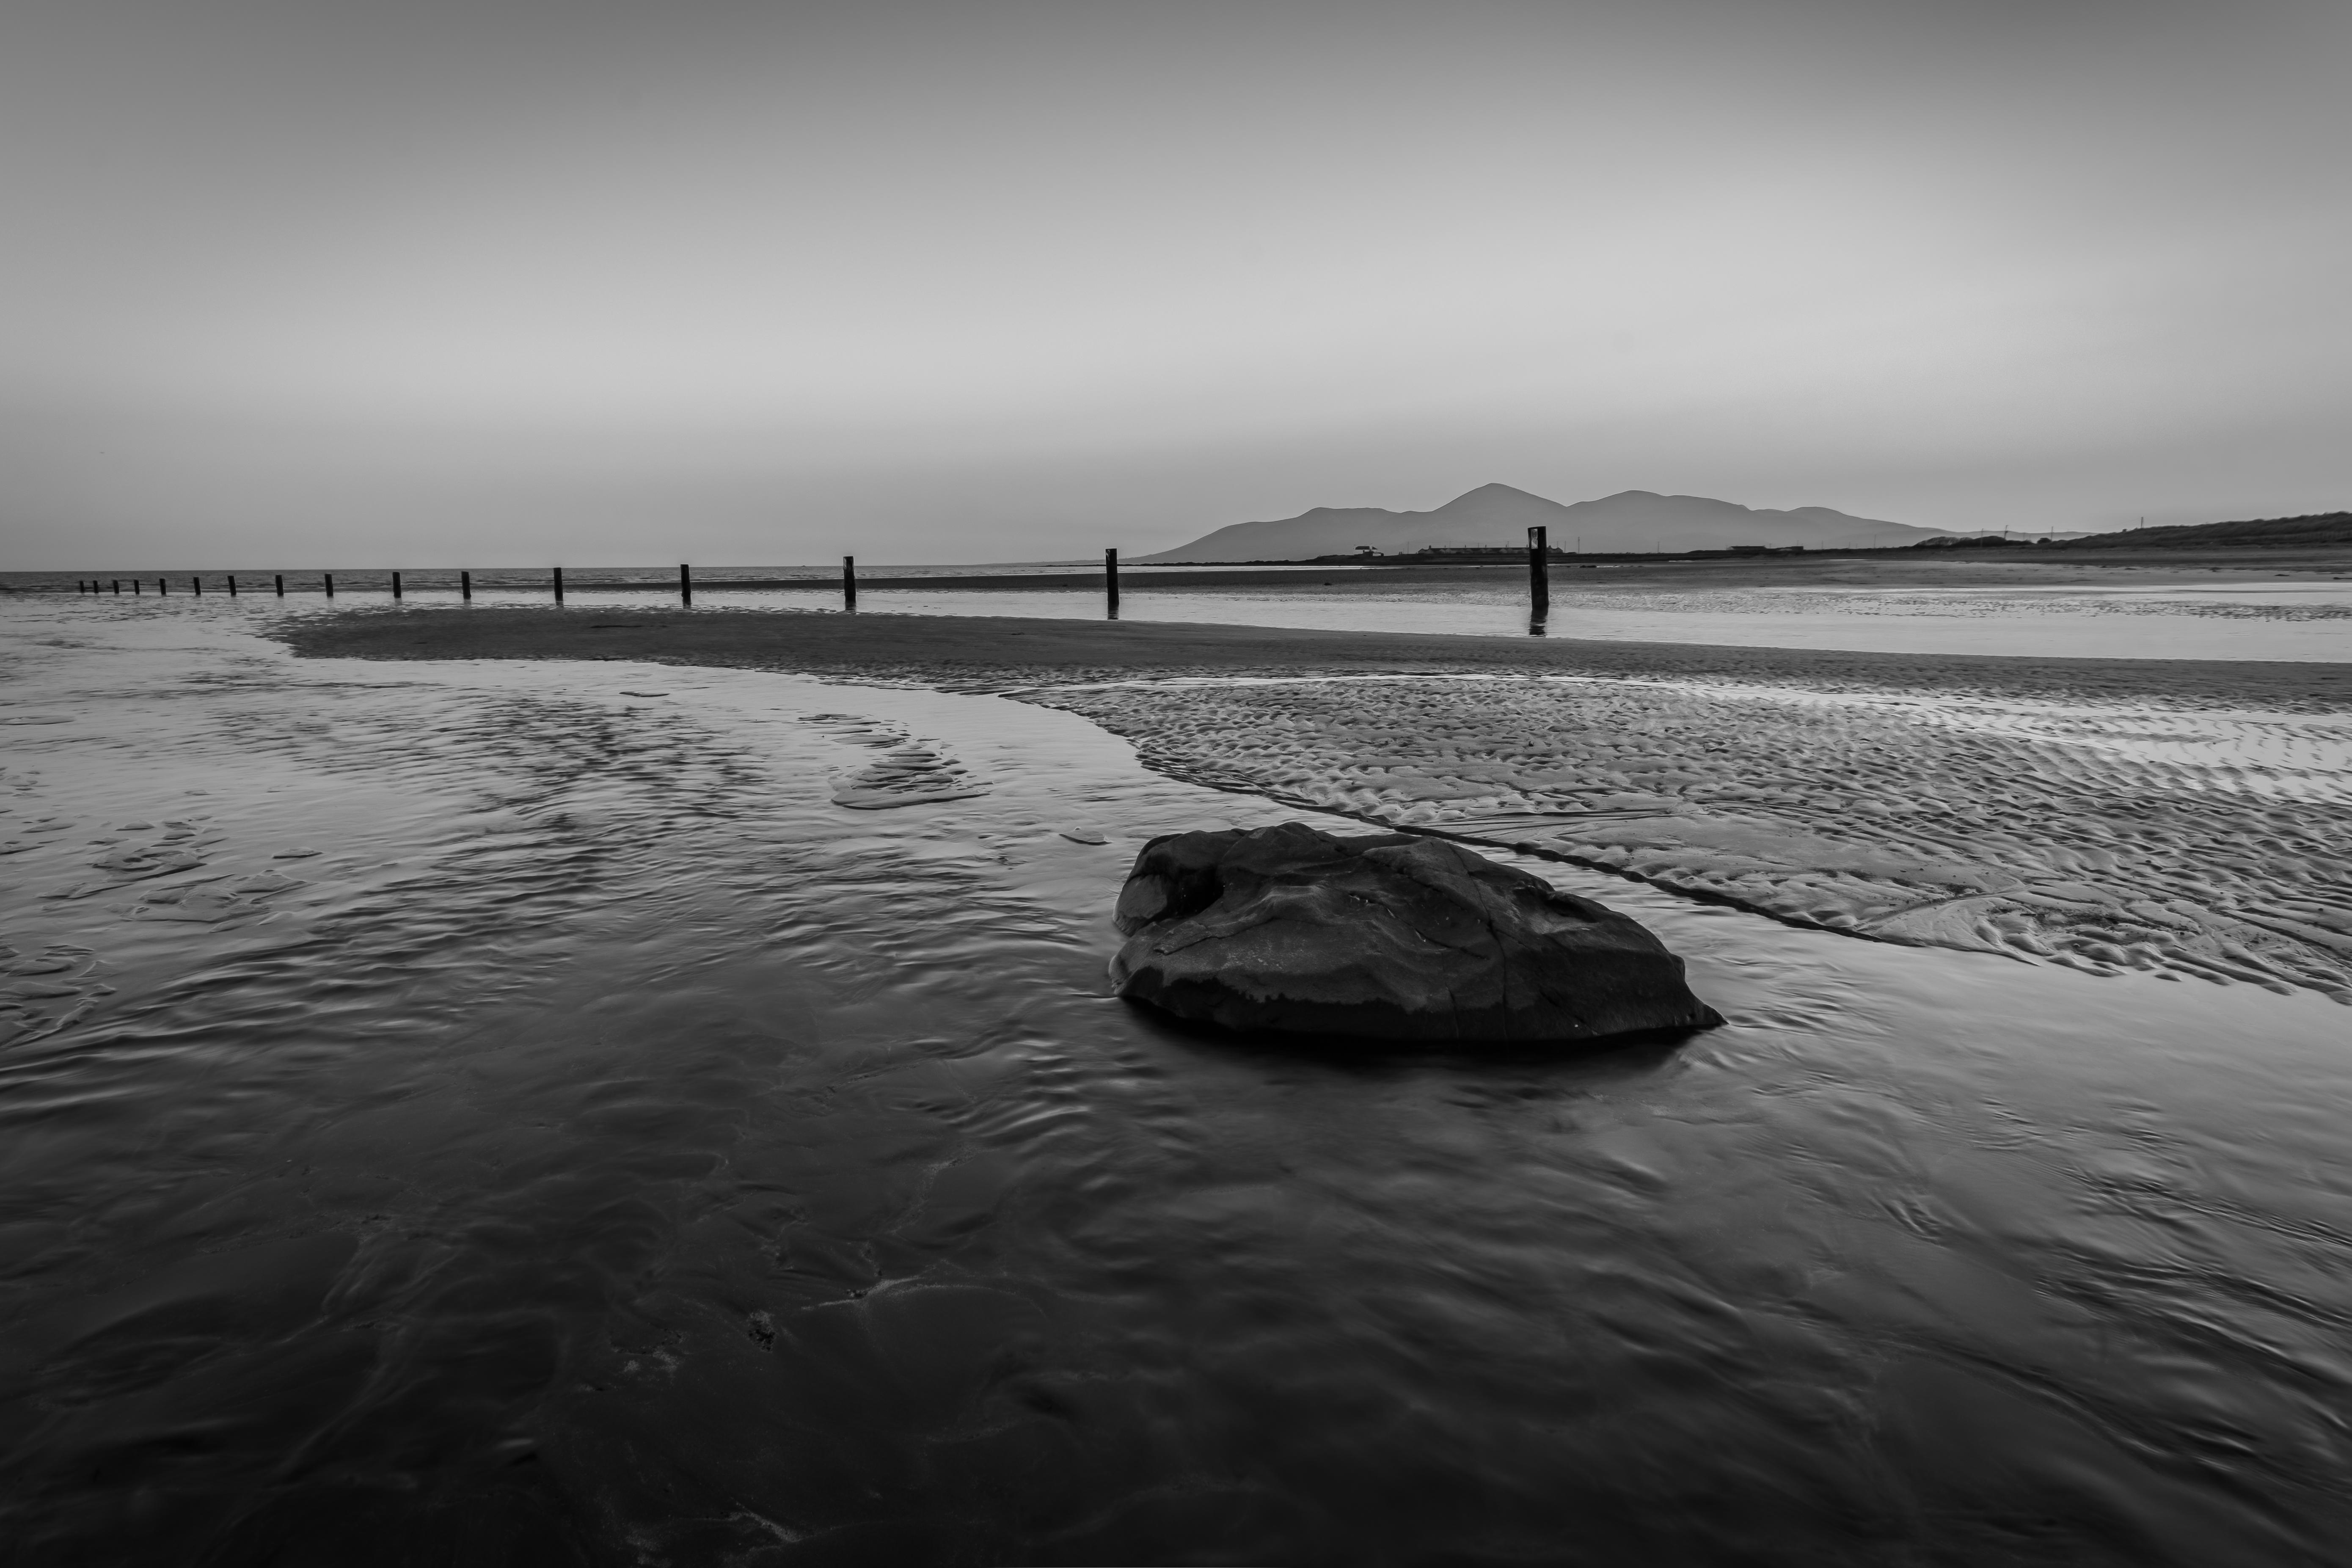 Peacefulness Tyrella Beach - REF:27